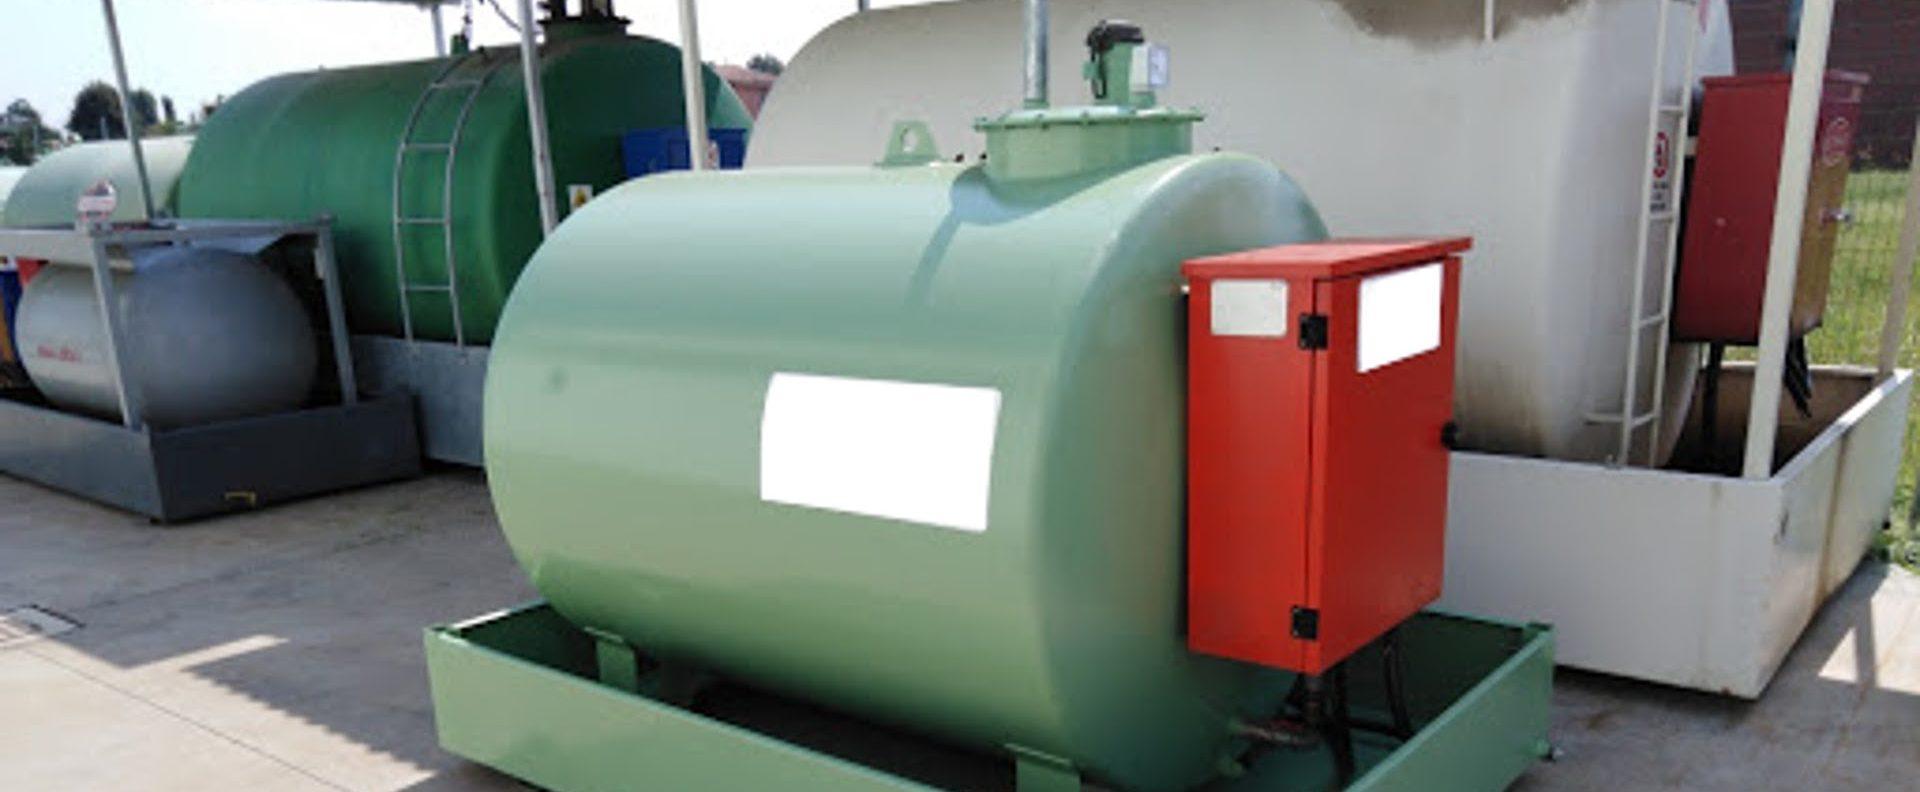 Depositi gasolio in agricoltura